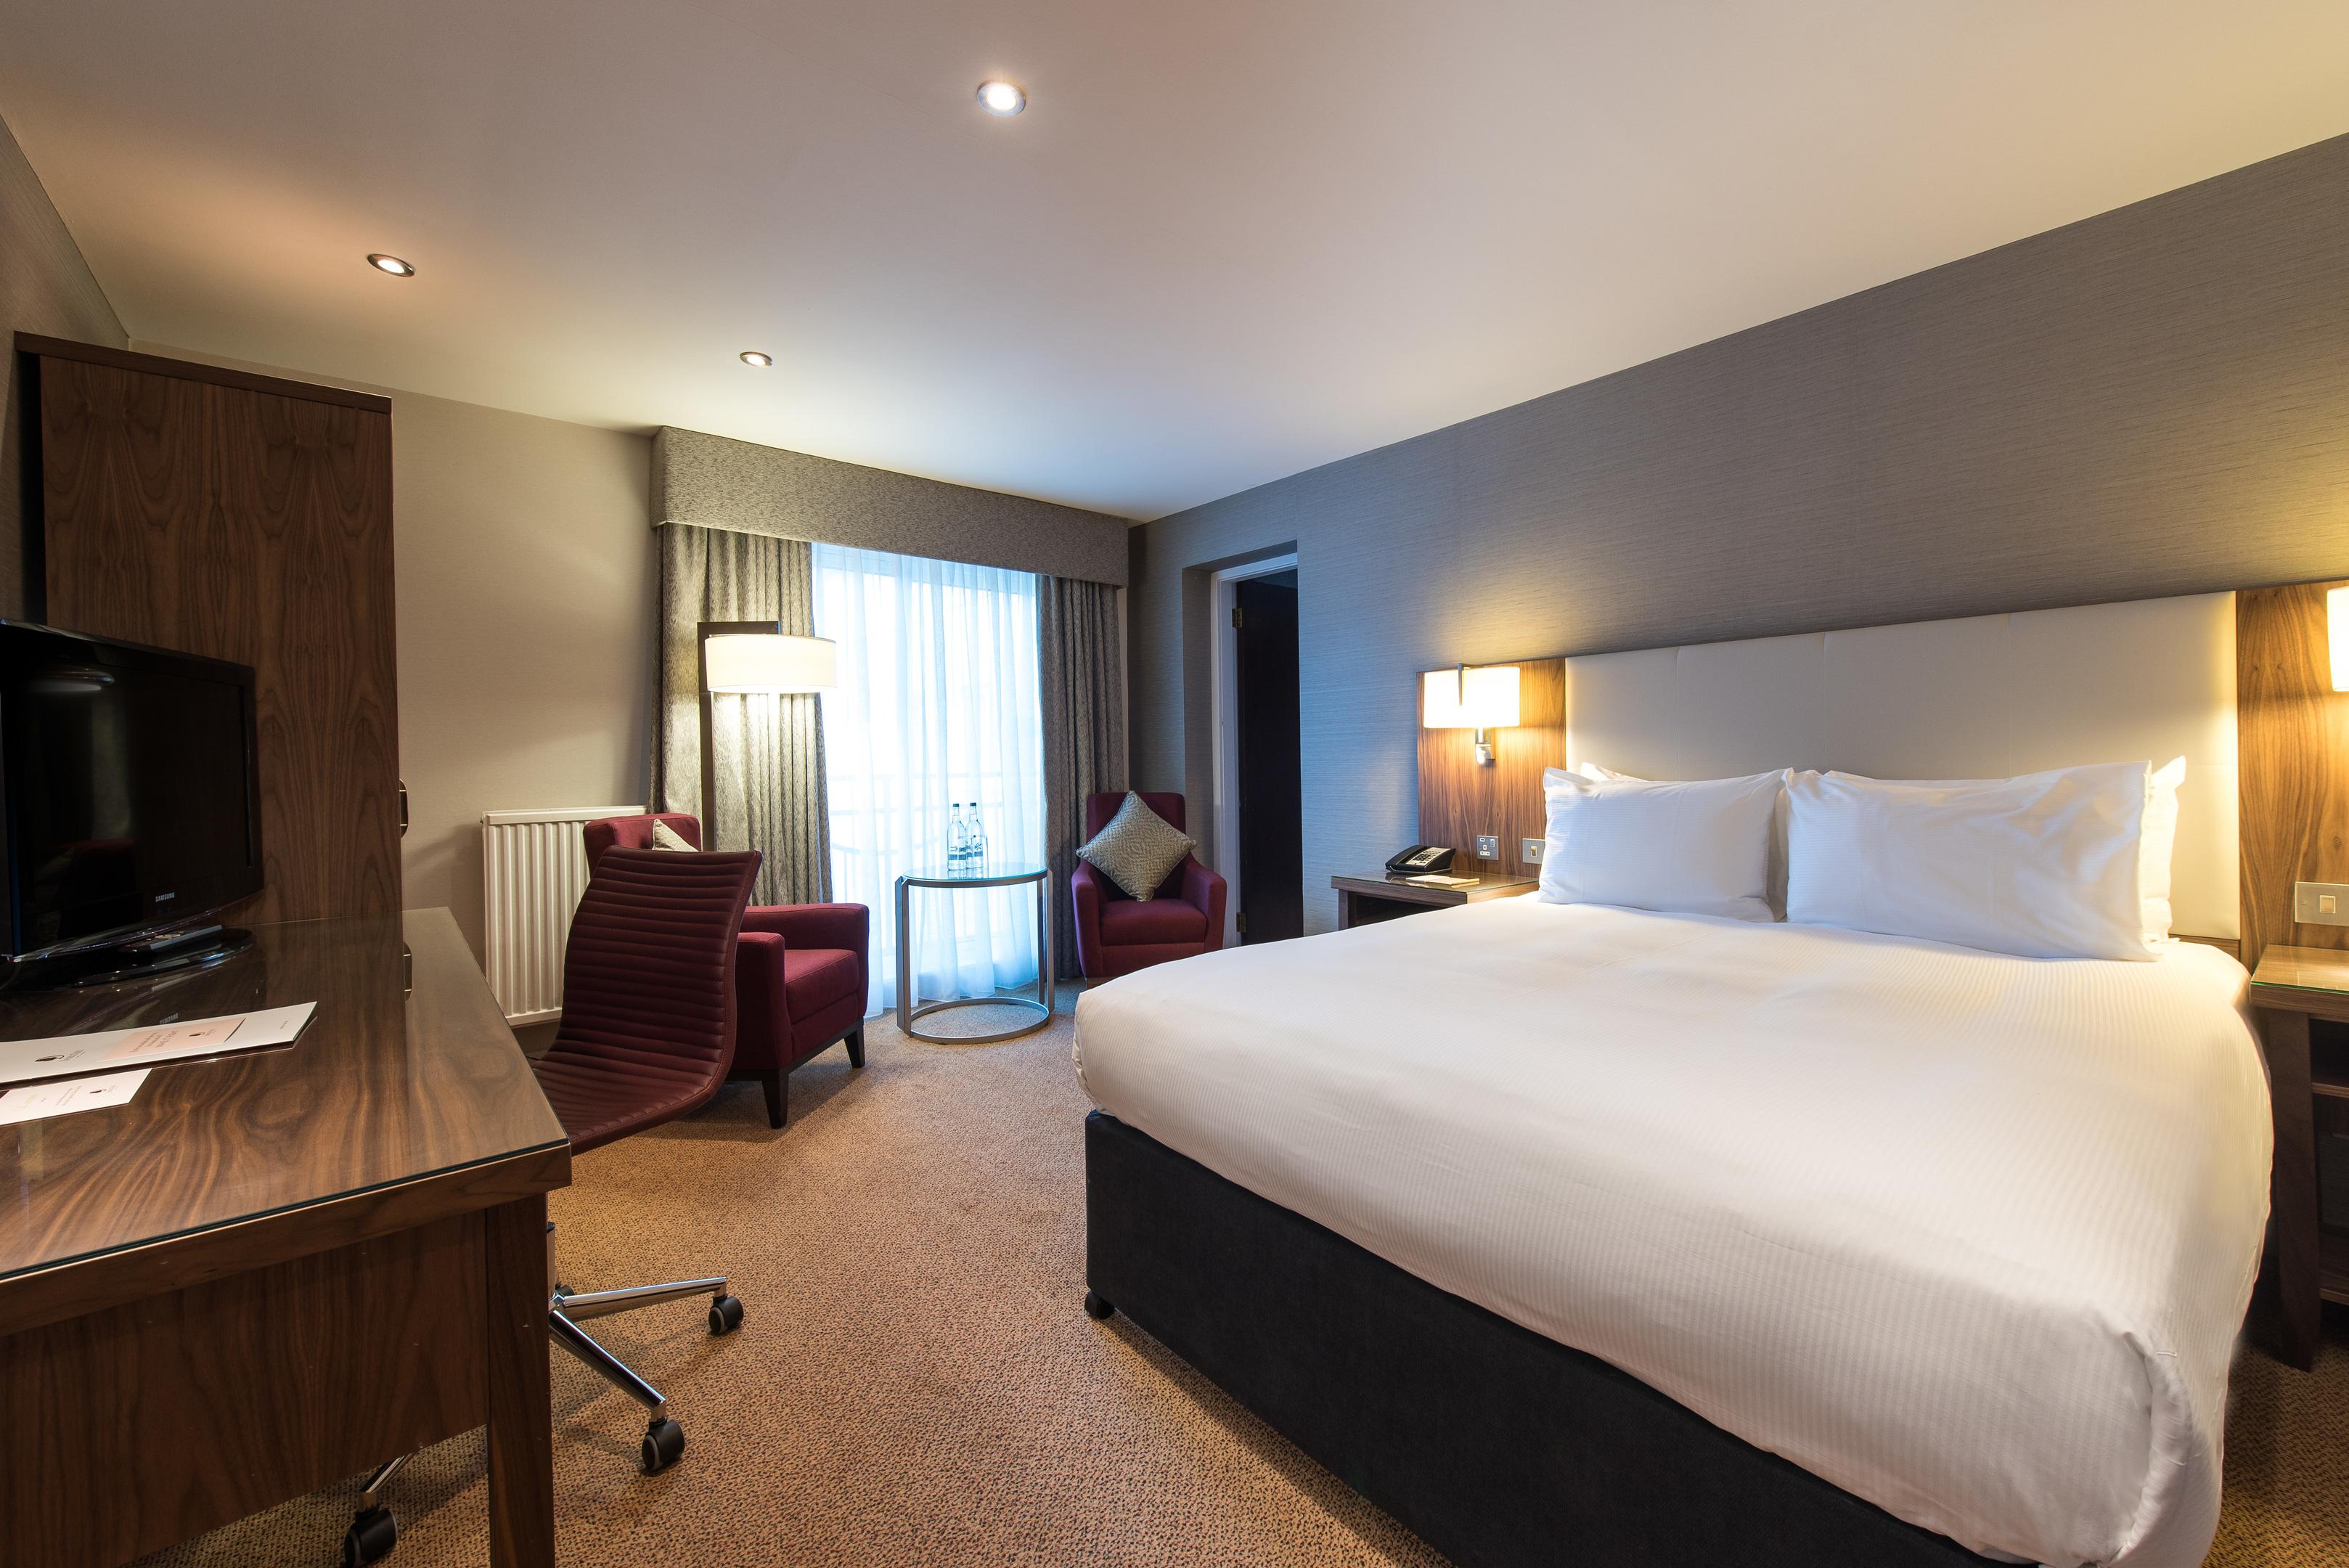 Hilton Hotel Aberdeen